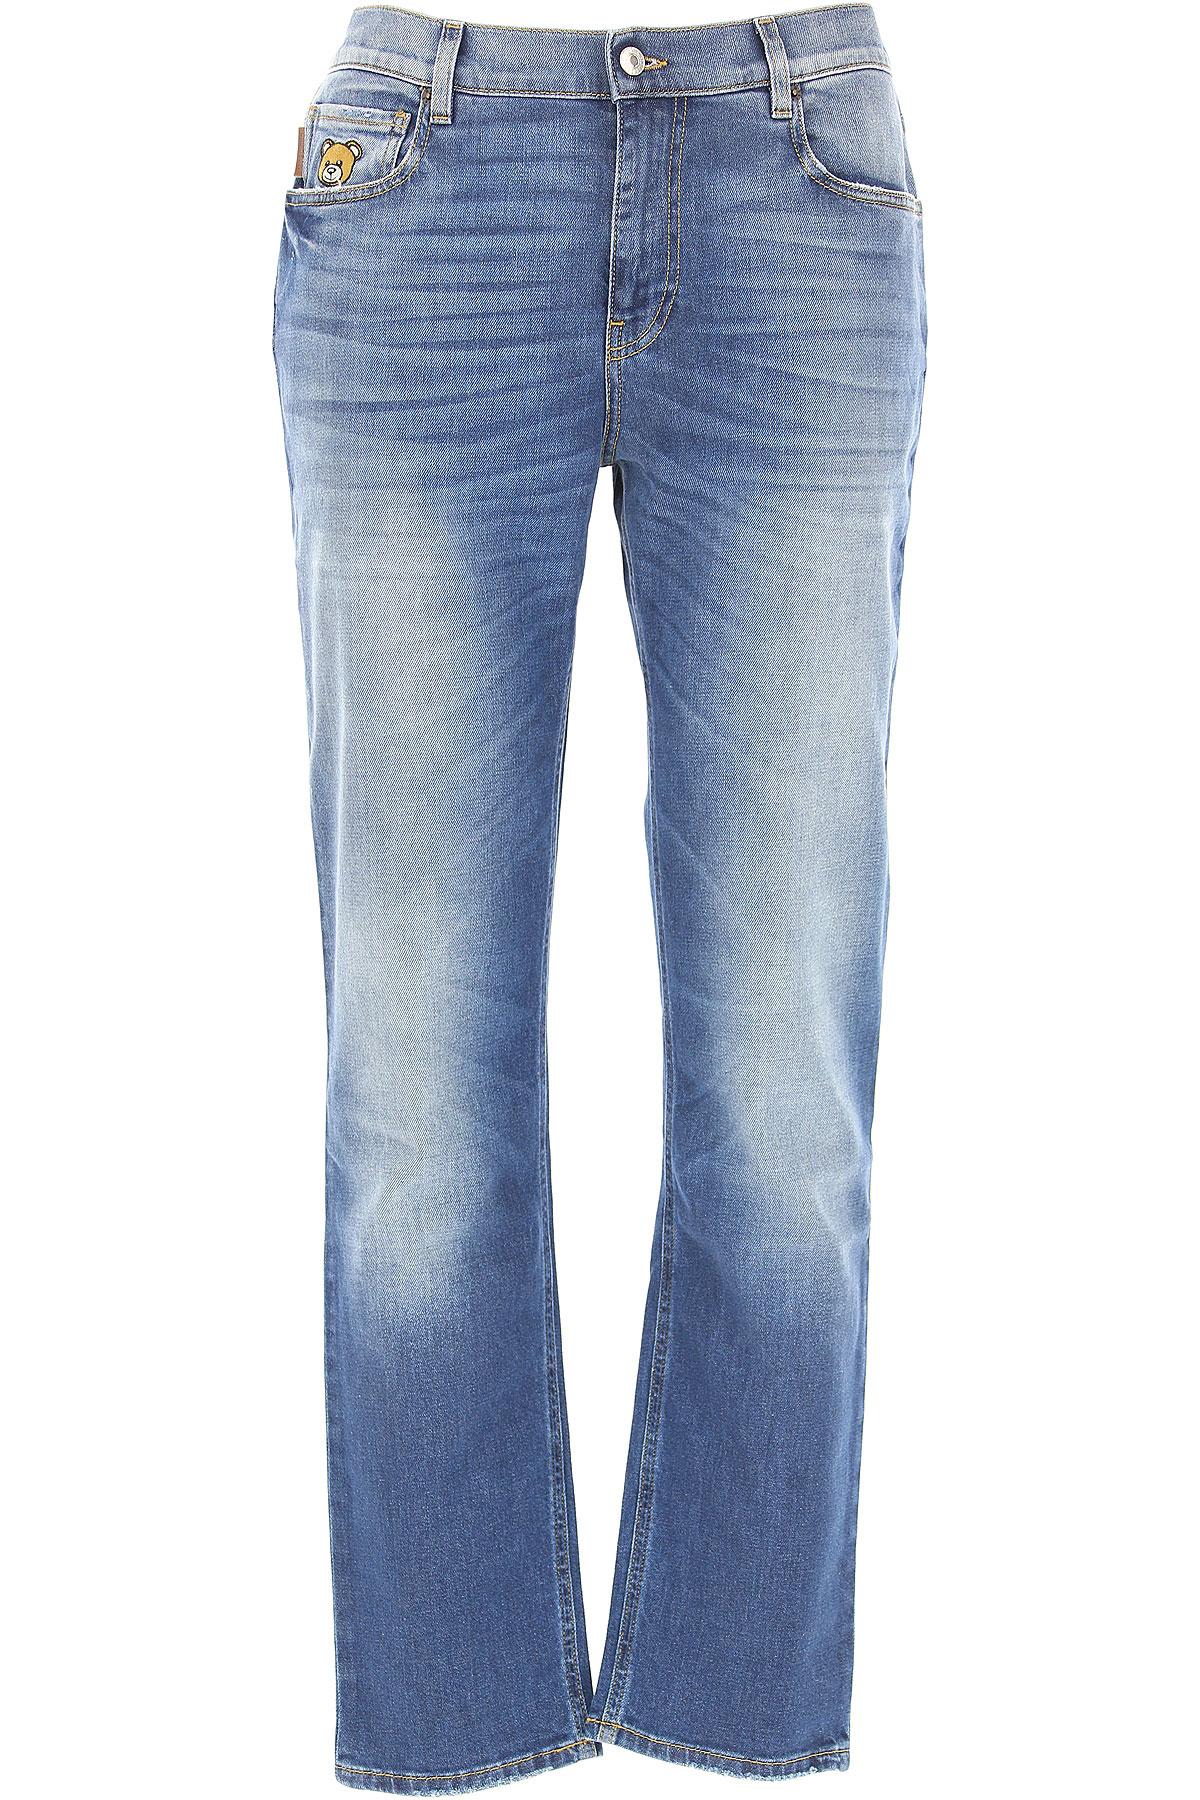 Moschino Jeans, Denim, Cotton, 2017, 30 32 34 36 38 USA-472214